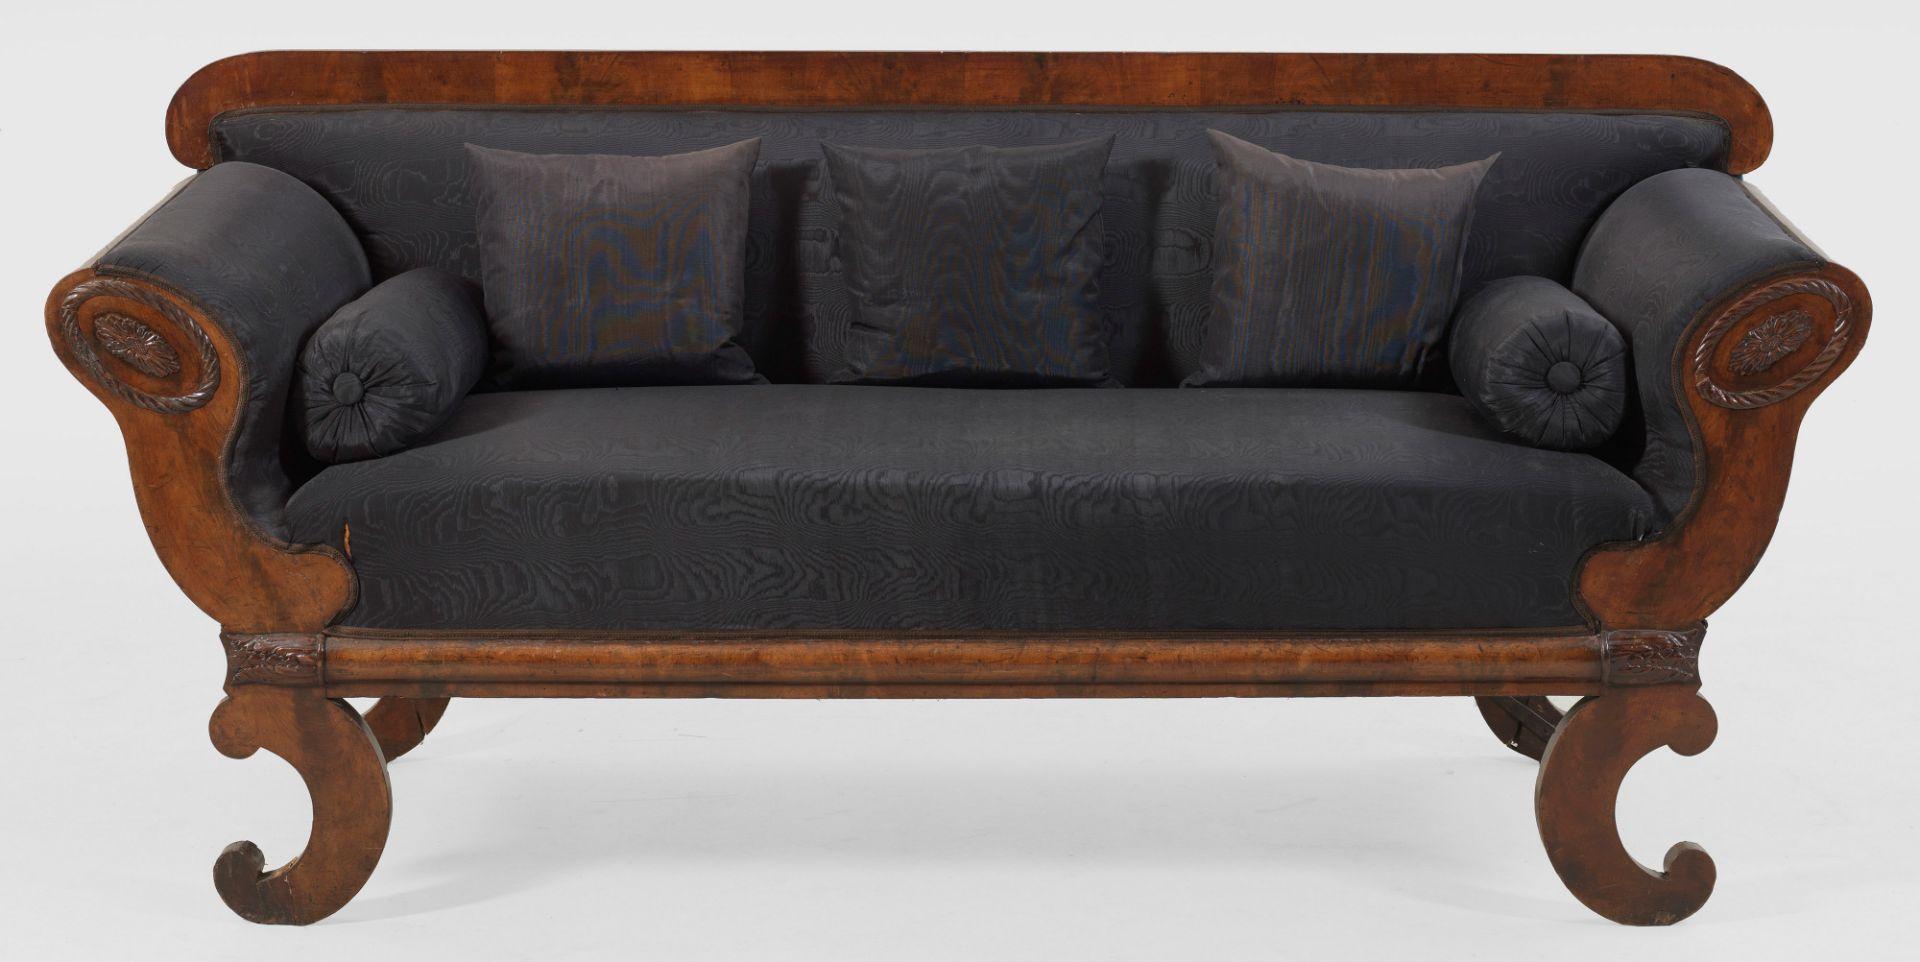 Großes Biedermeier-Sofa